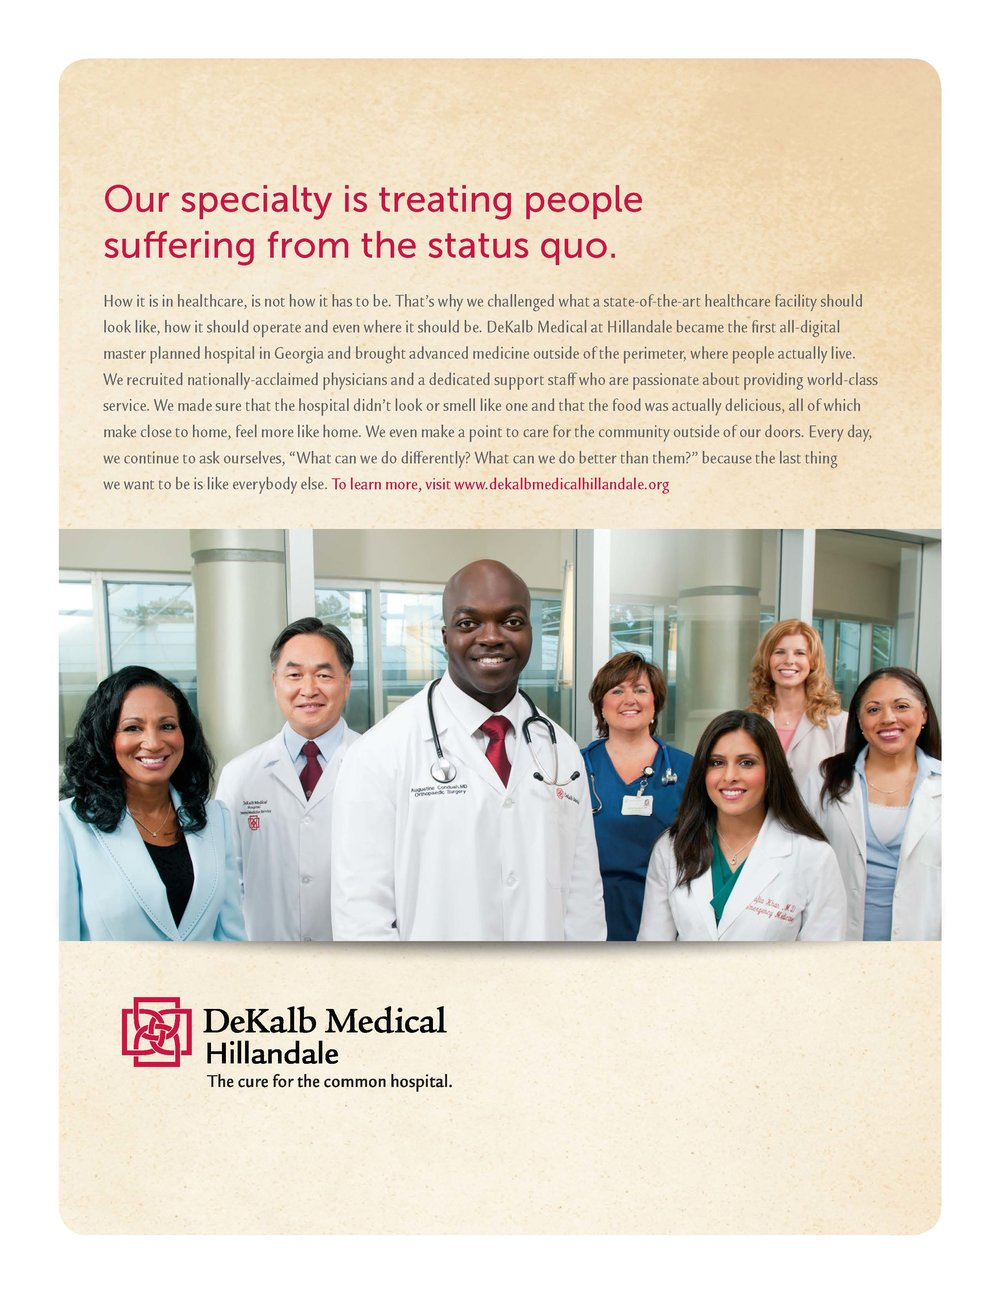 DeKalb-Medical_Hillandale_2 Print Ads_Page_1.jpg